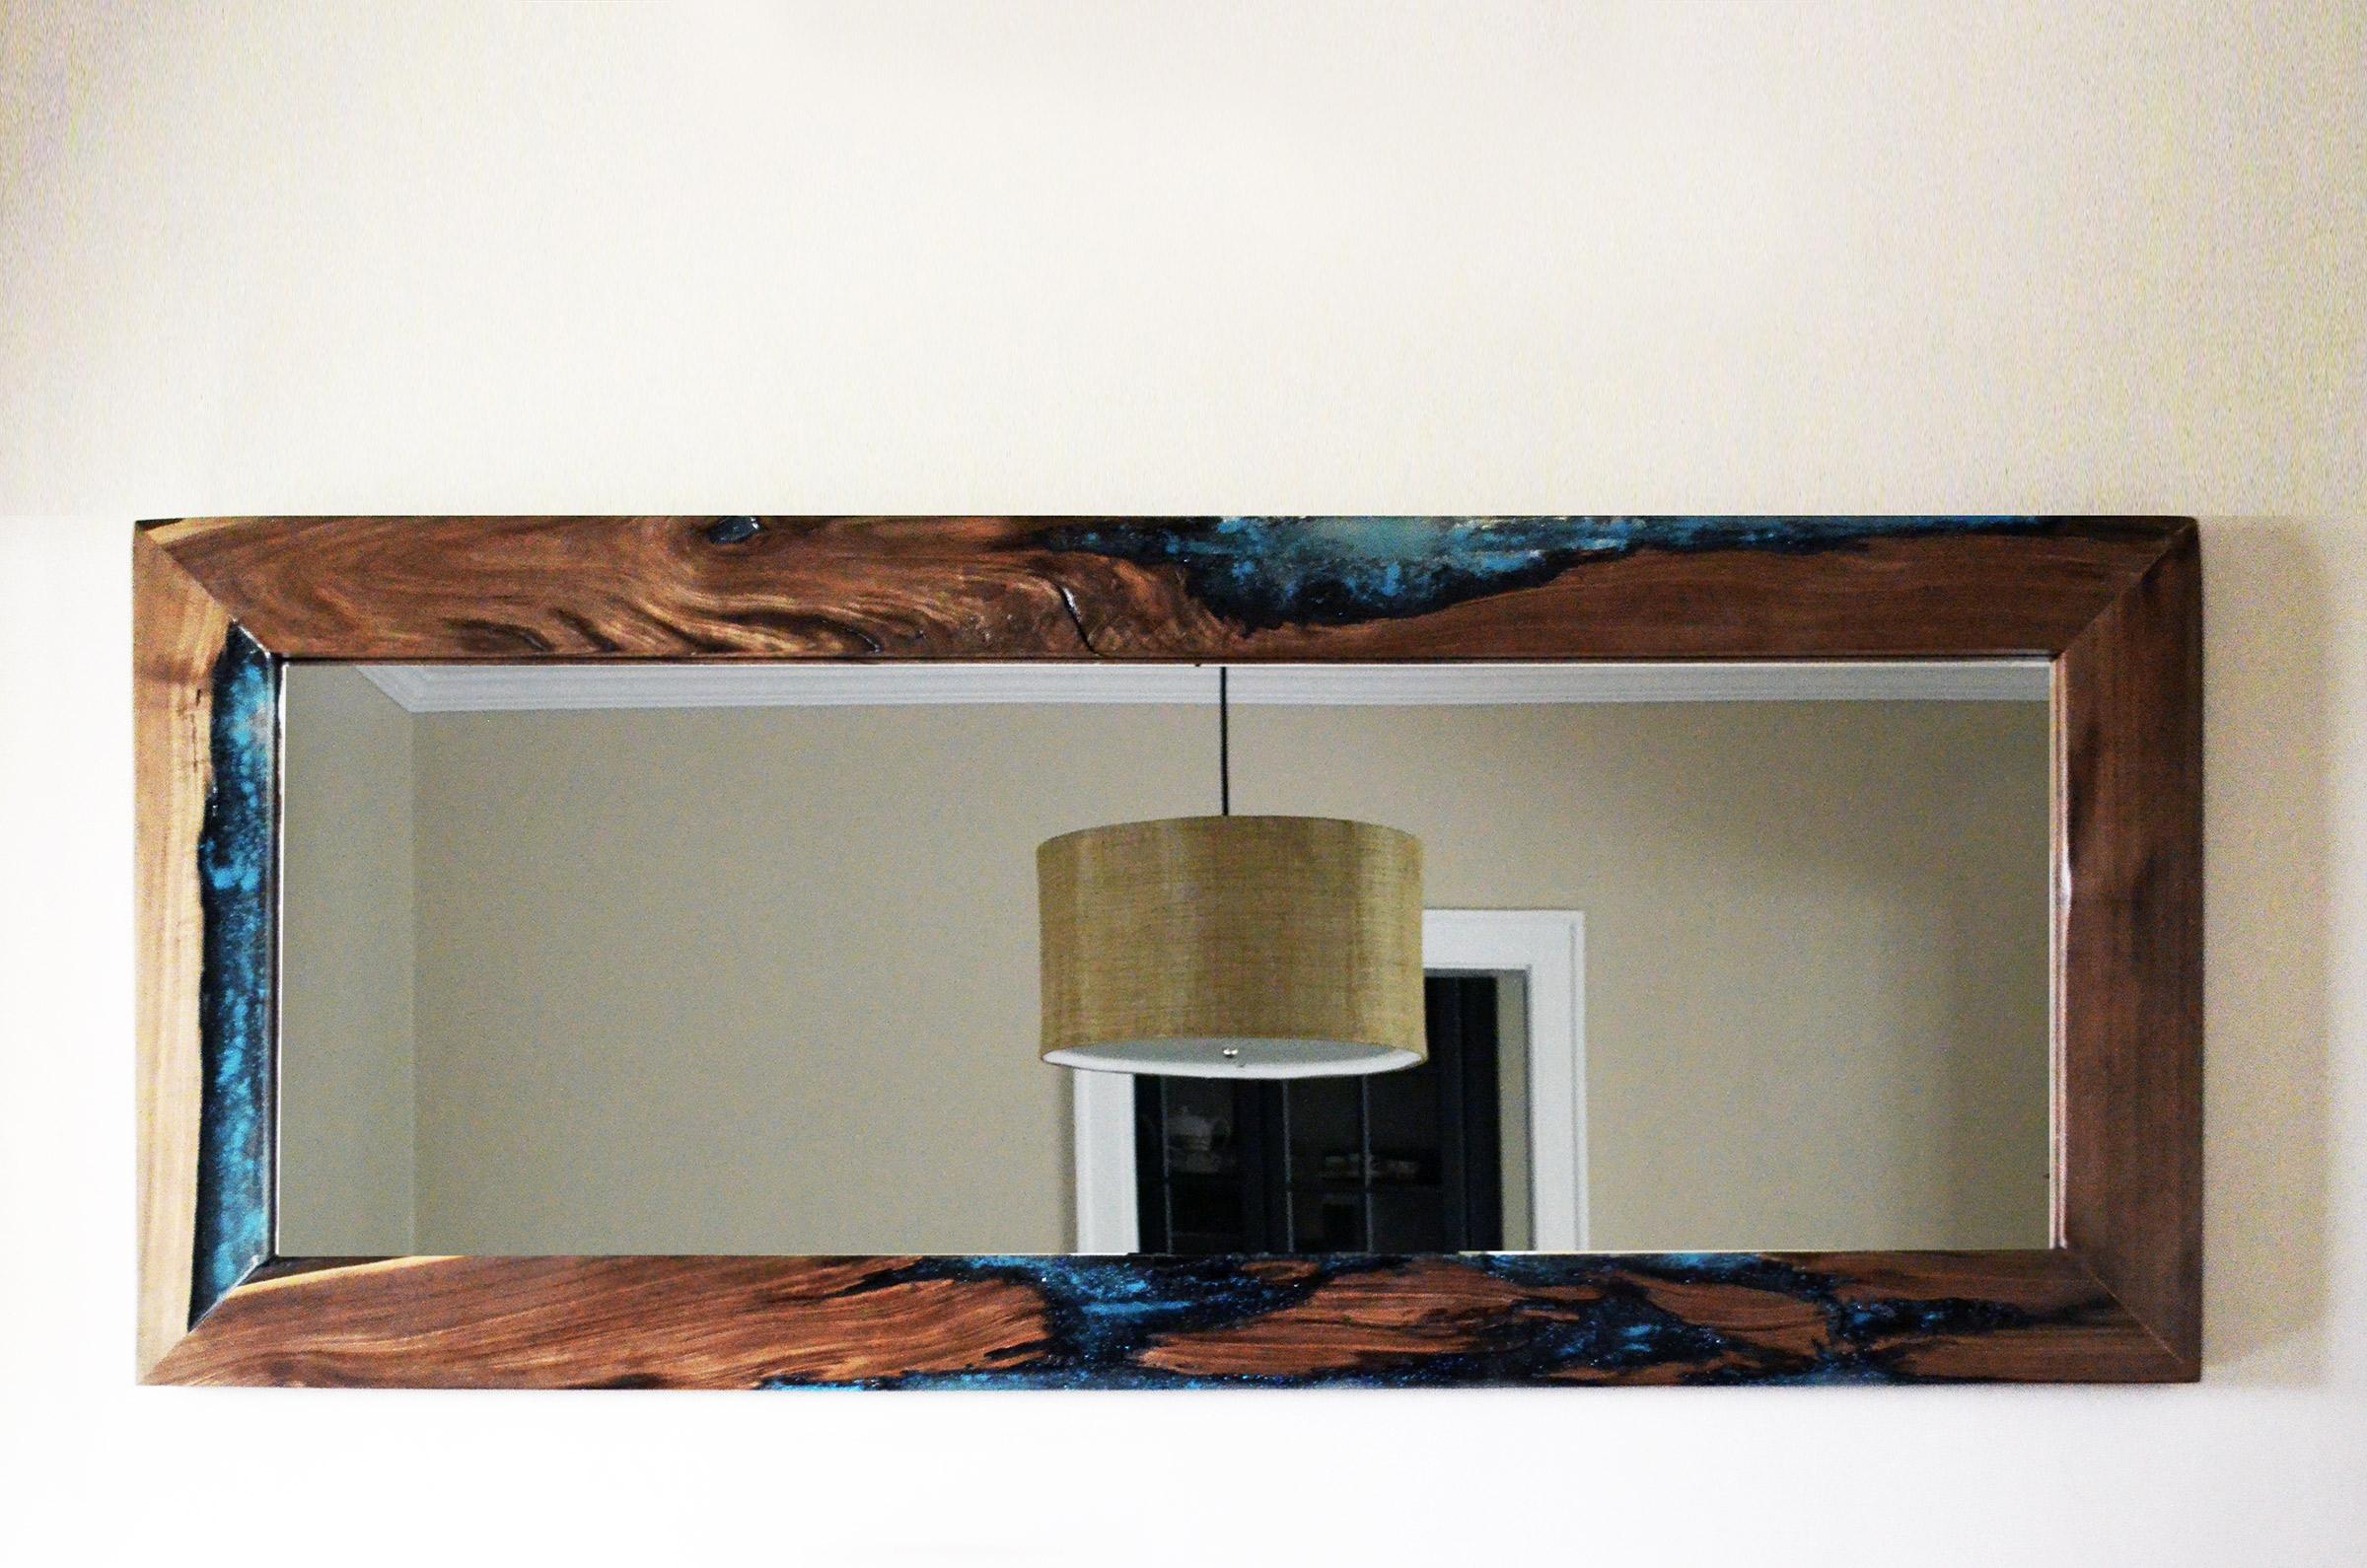 Bathroom vanity wall cabinet - Live Edge Walnut Mirror Large Abodeacious